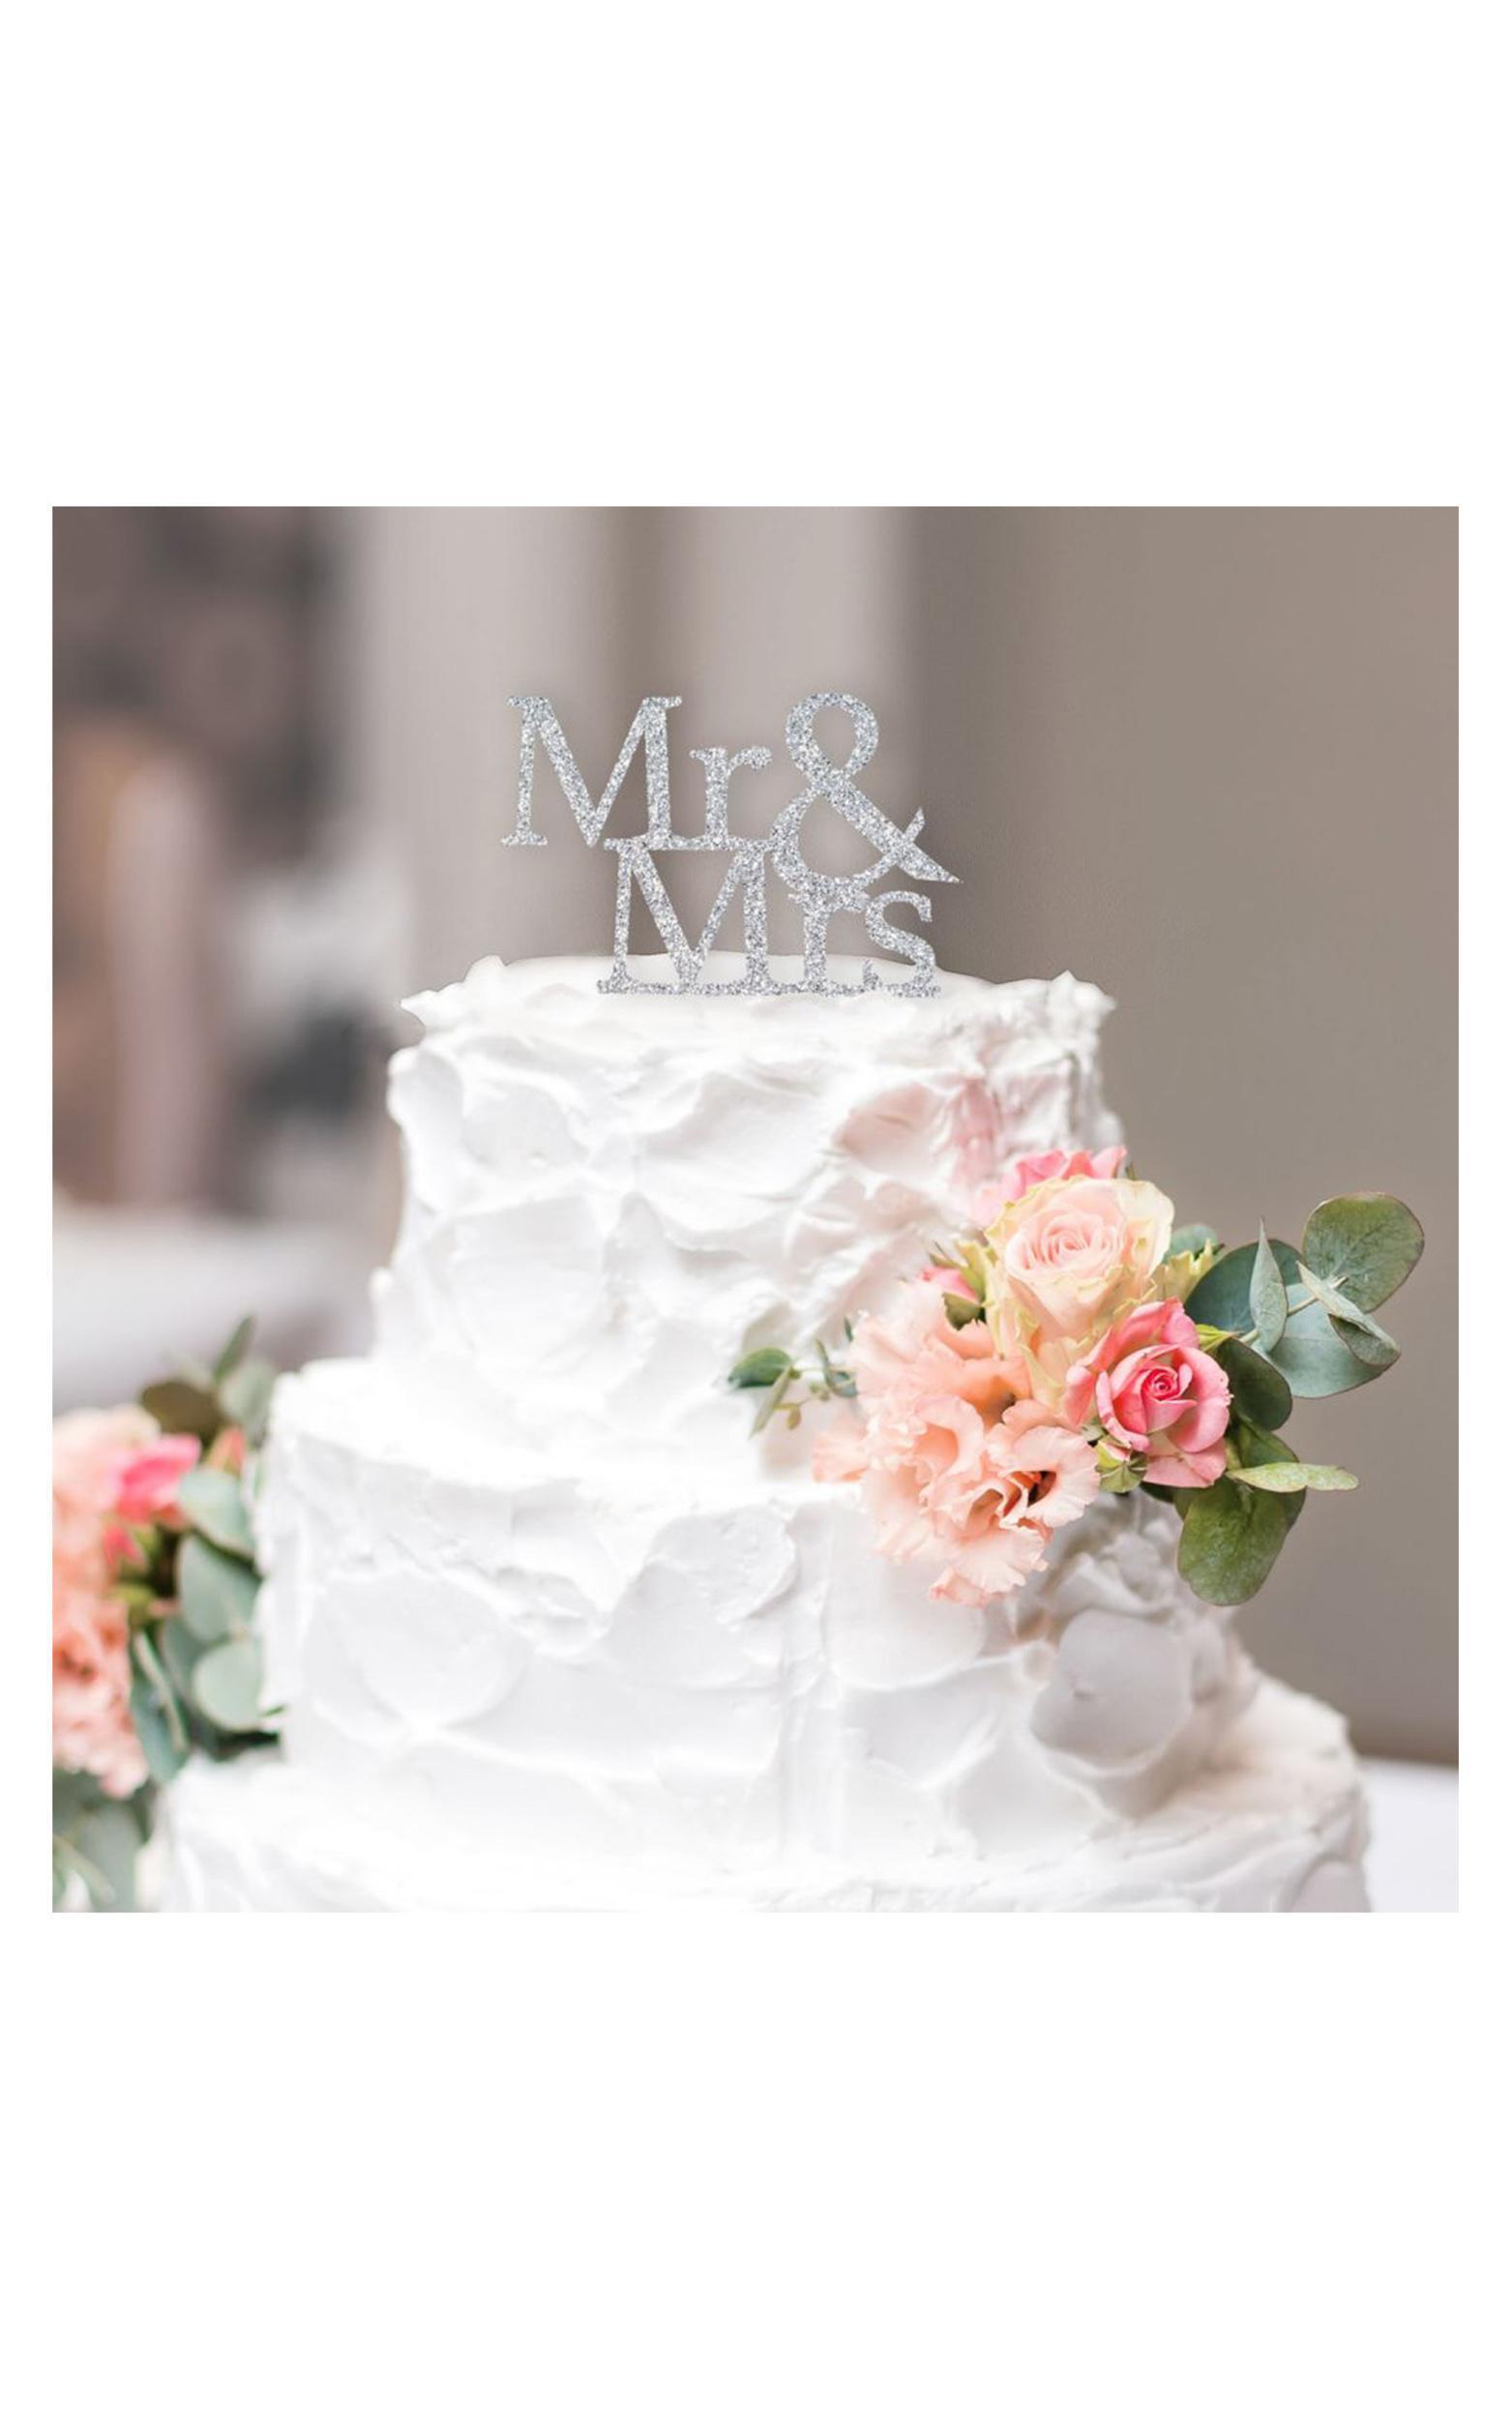 Mr & Mrs Wedding Cake Topper In Silver Glitter, , hi-res image number null